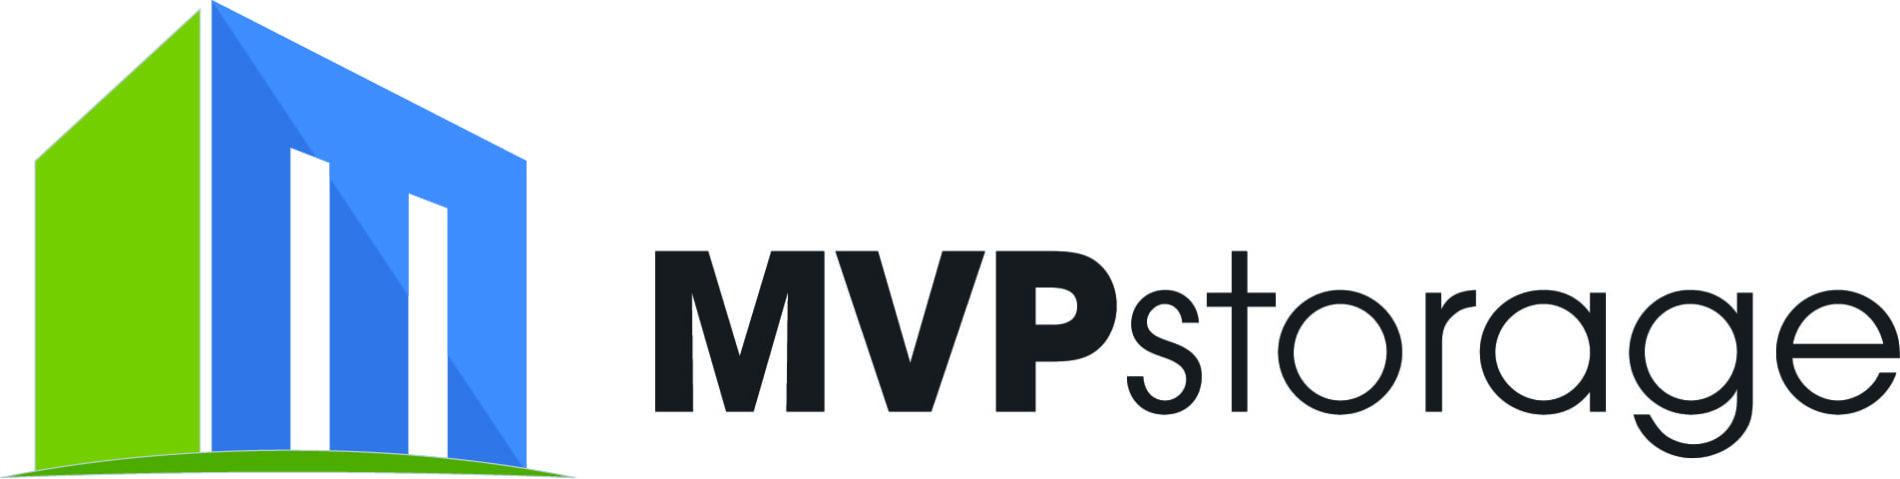 MVP Storage